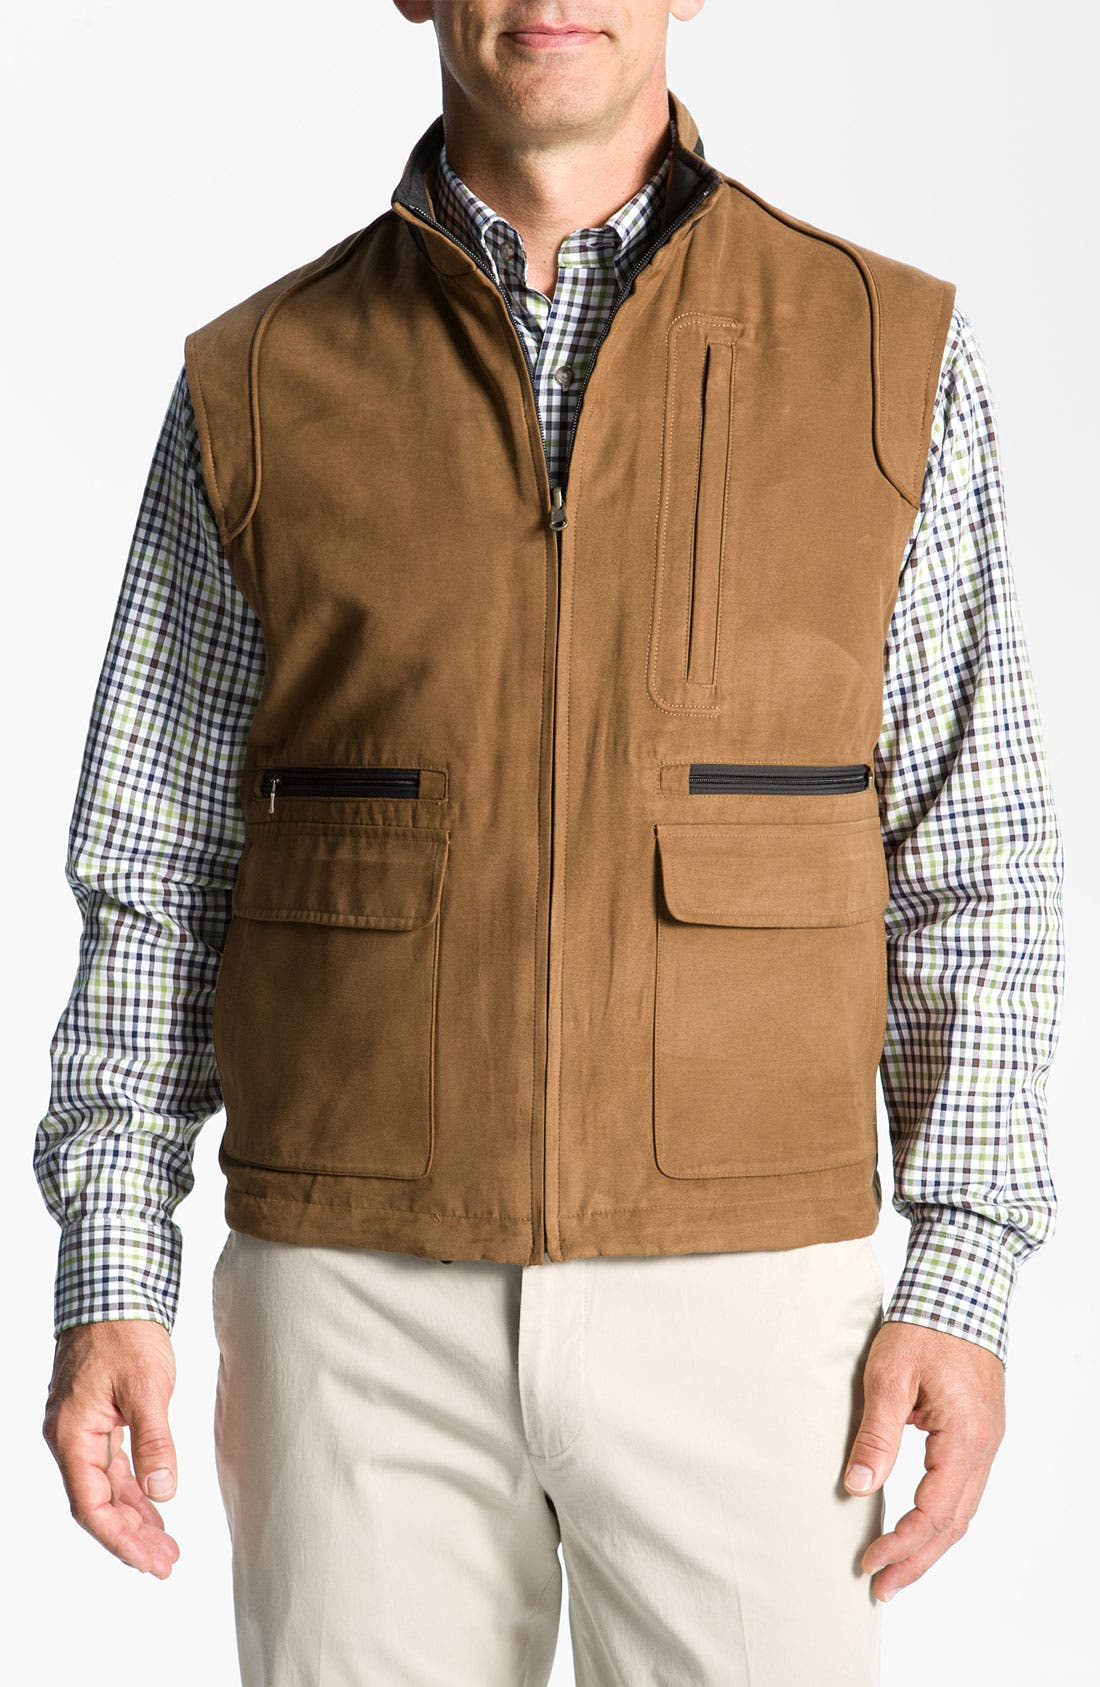 Alternate Image 1 Selected - Cutter & Buck 'Preston' Reversible Vest